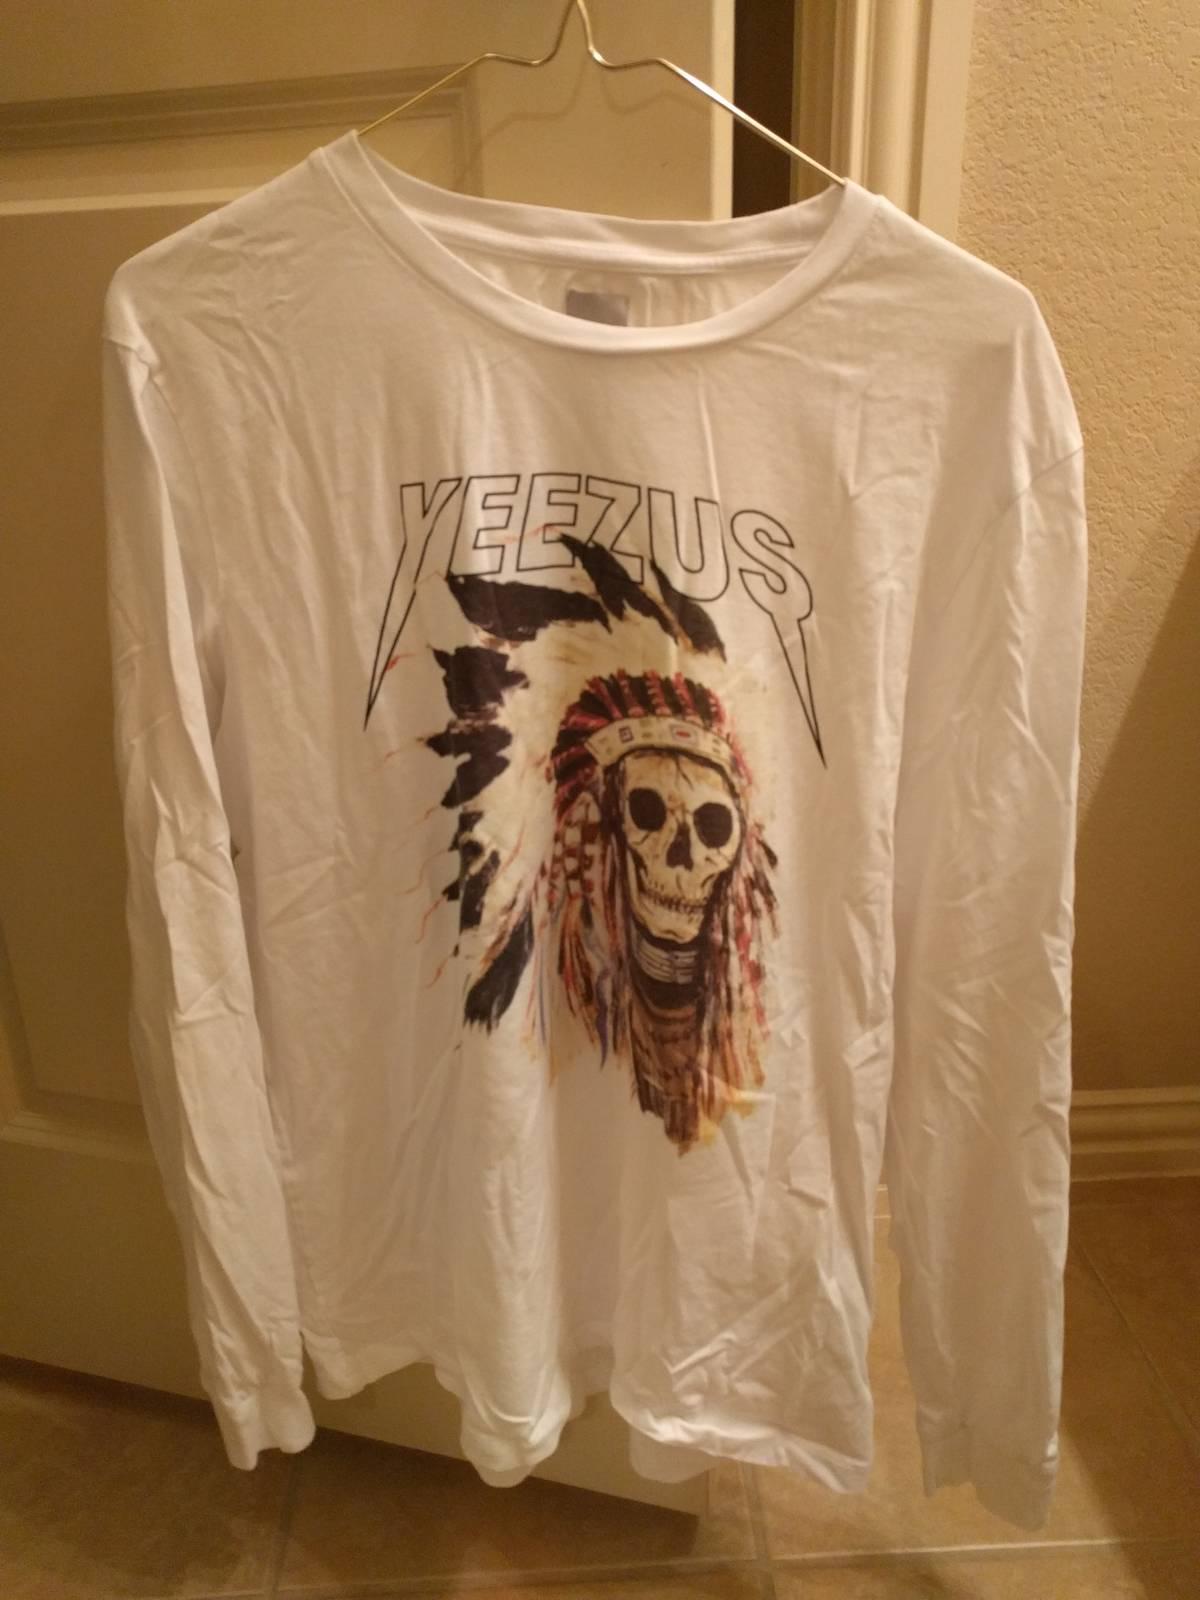 d11f4c68a80 Kanye West Yeezus T Shirt Asos - BCD Tofu House